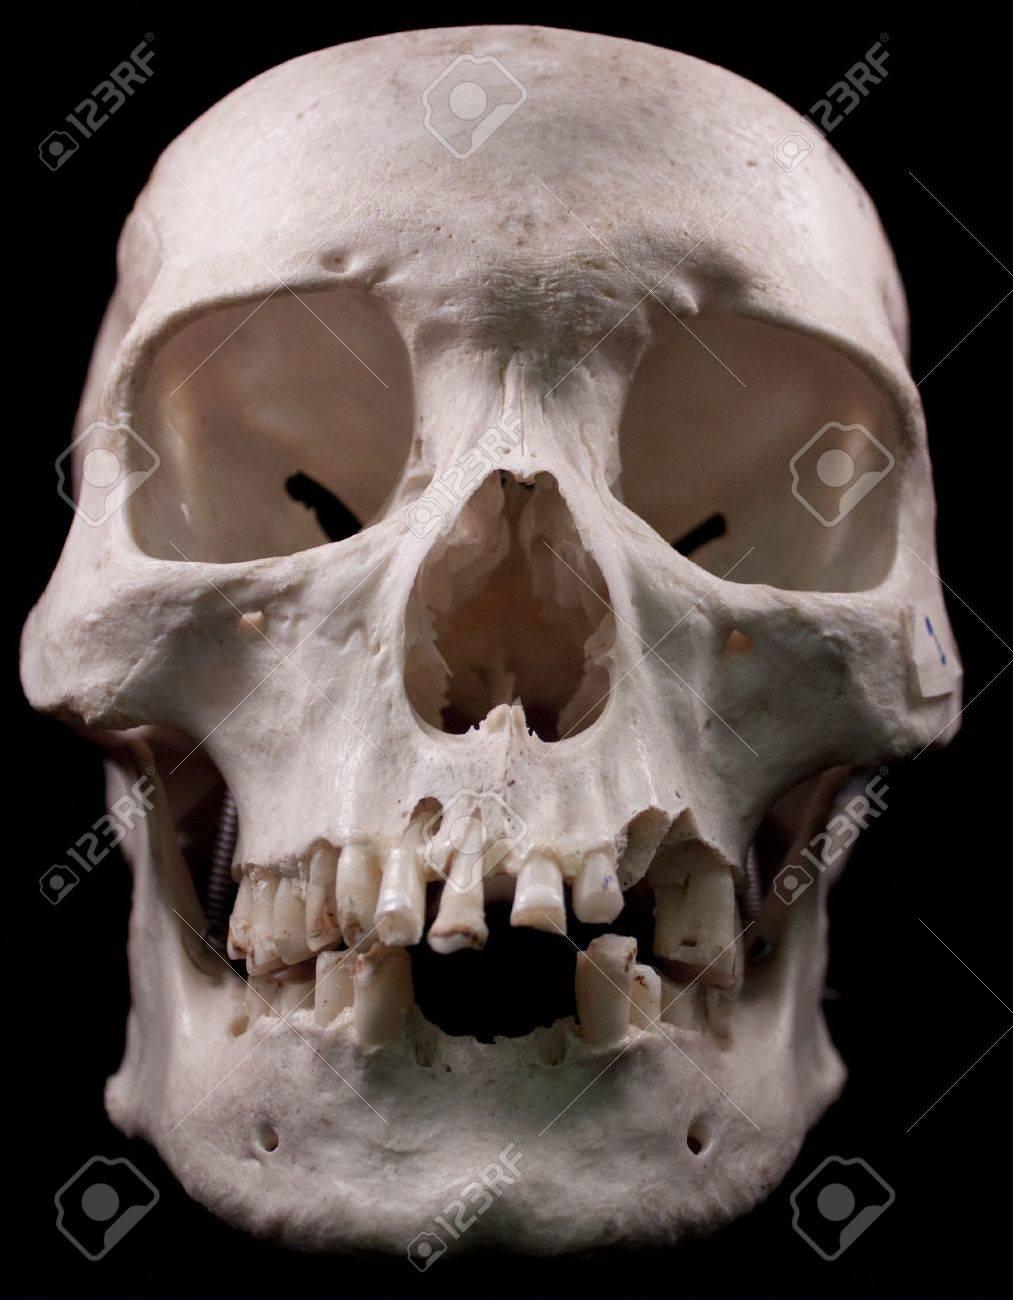 Human skull - bone head dead teeth spooky scary pirate isolated evil Stock Photo - 9895227